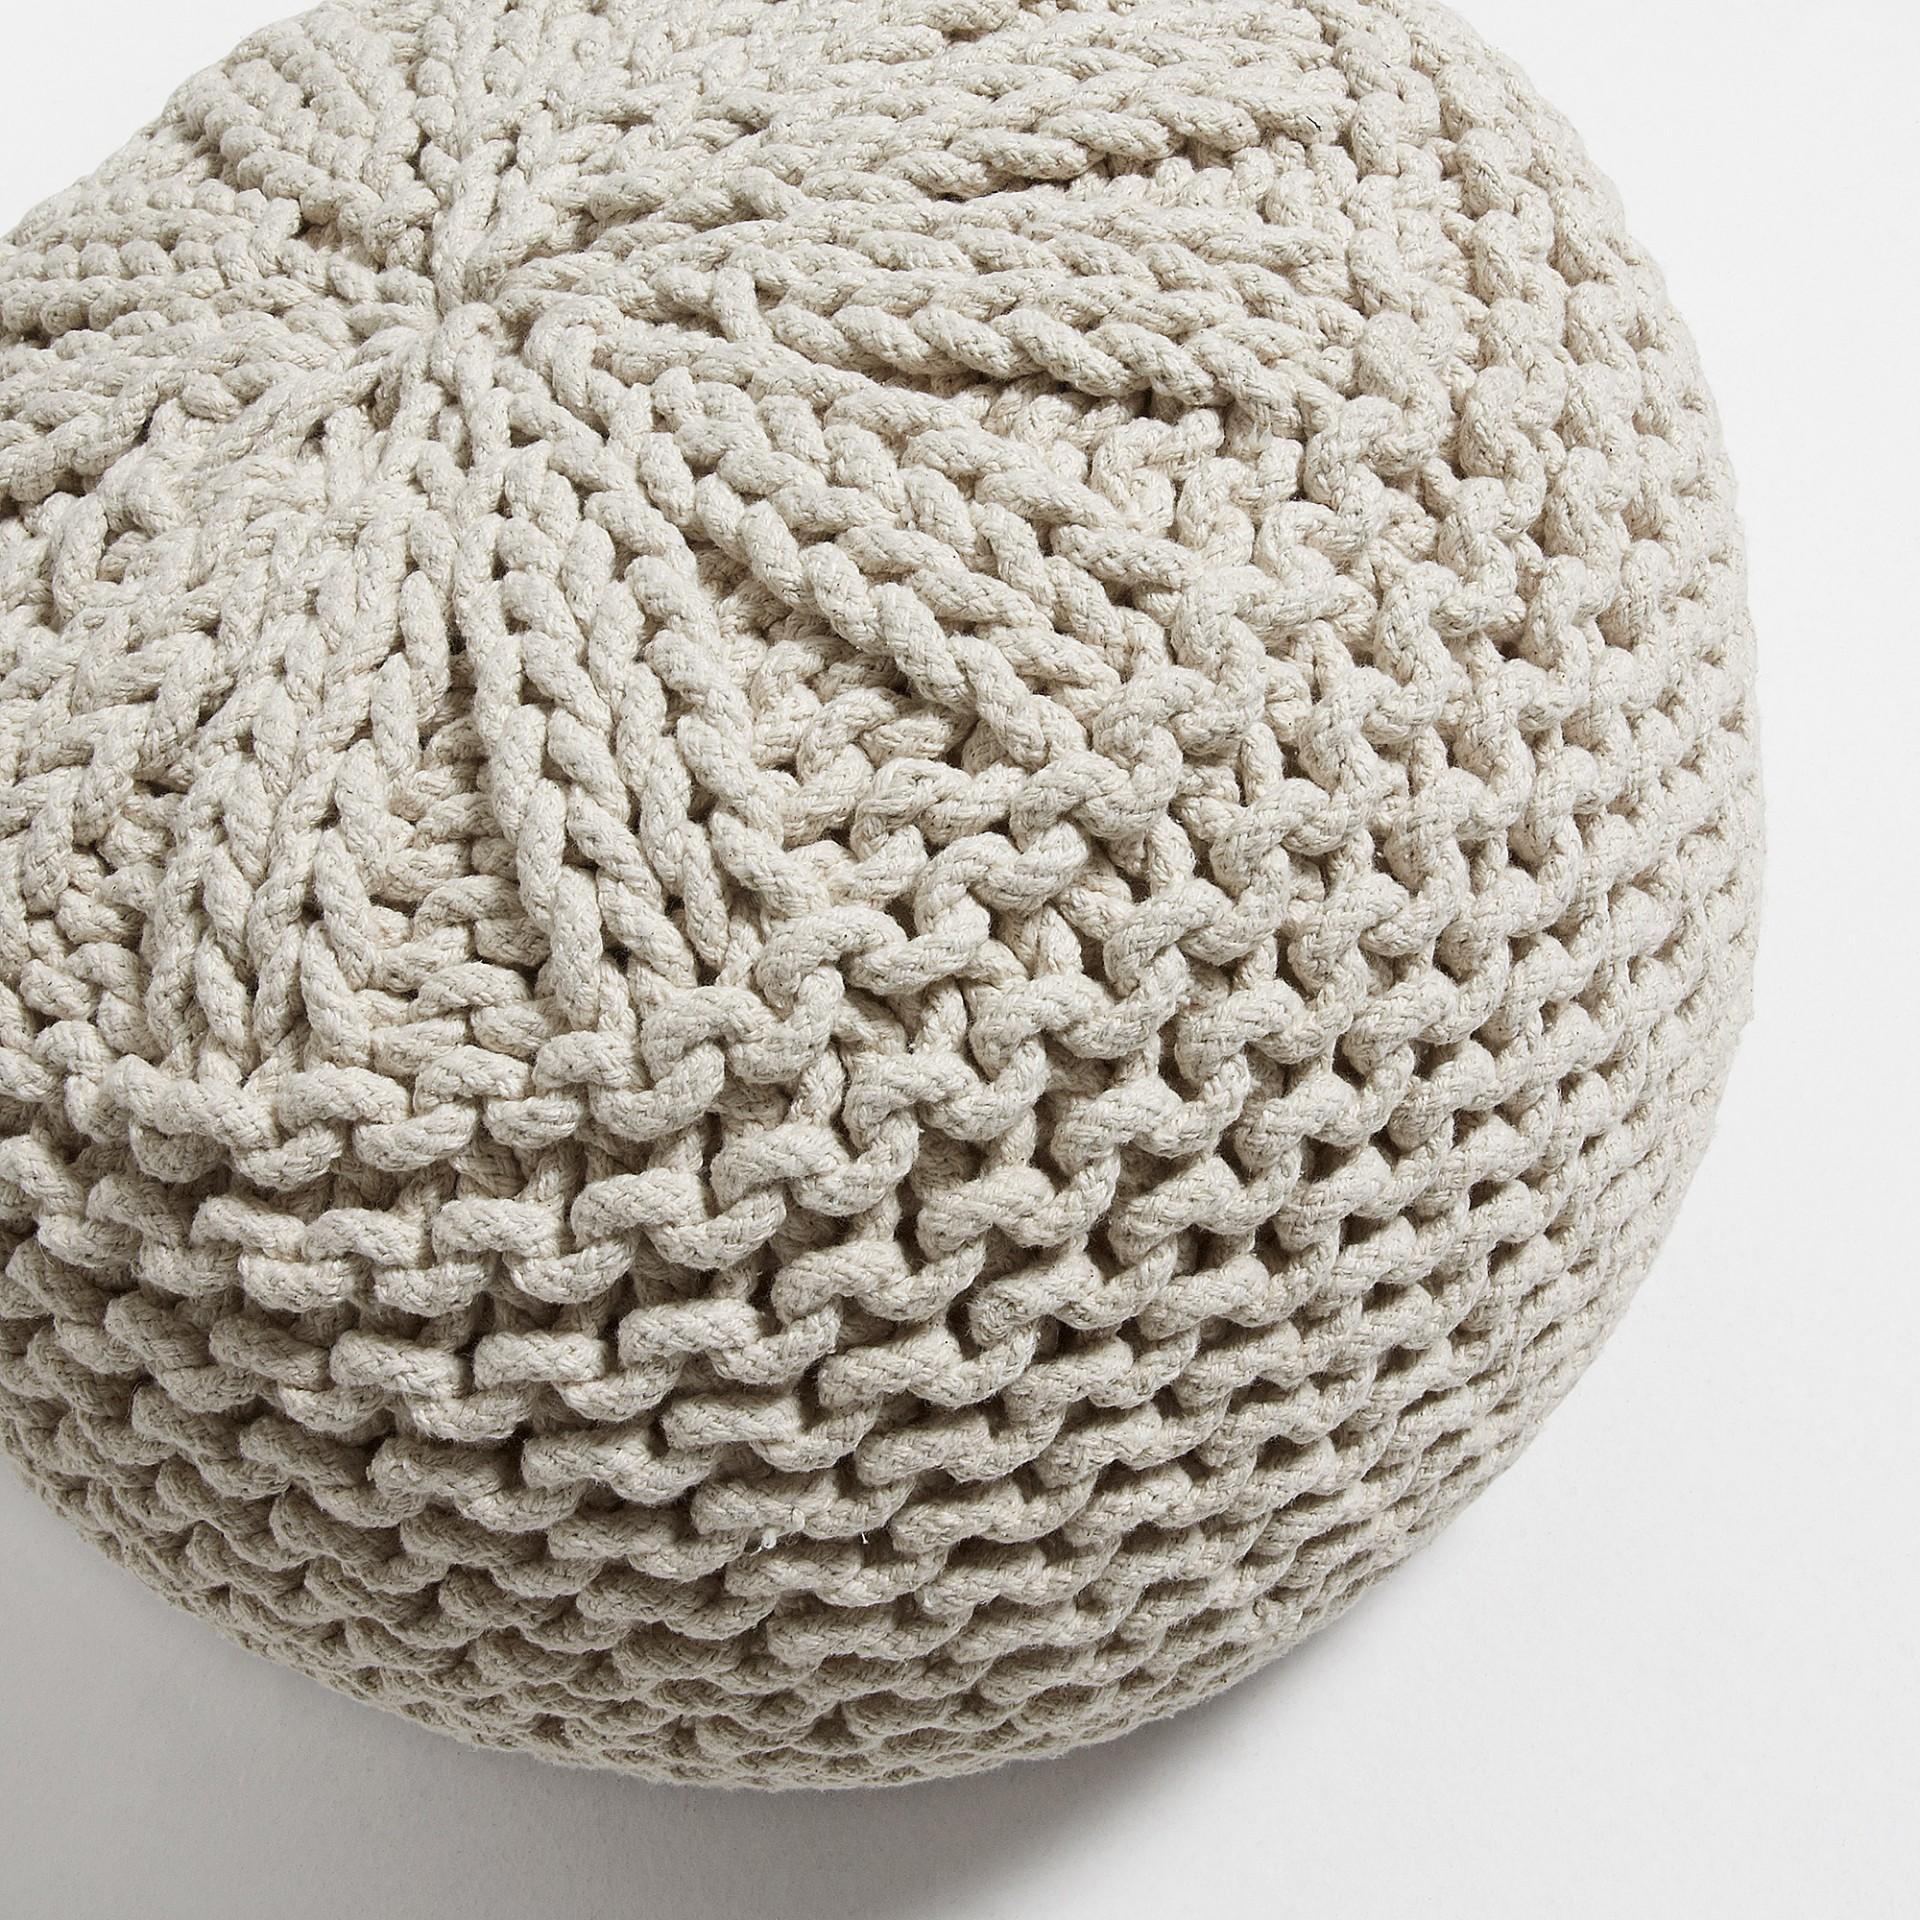 Pufe Shote, malha de croché, Ø50x35